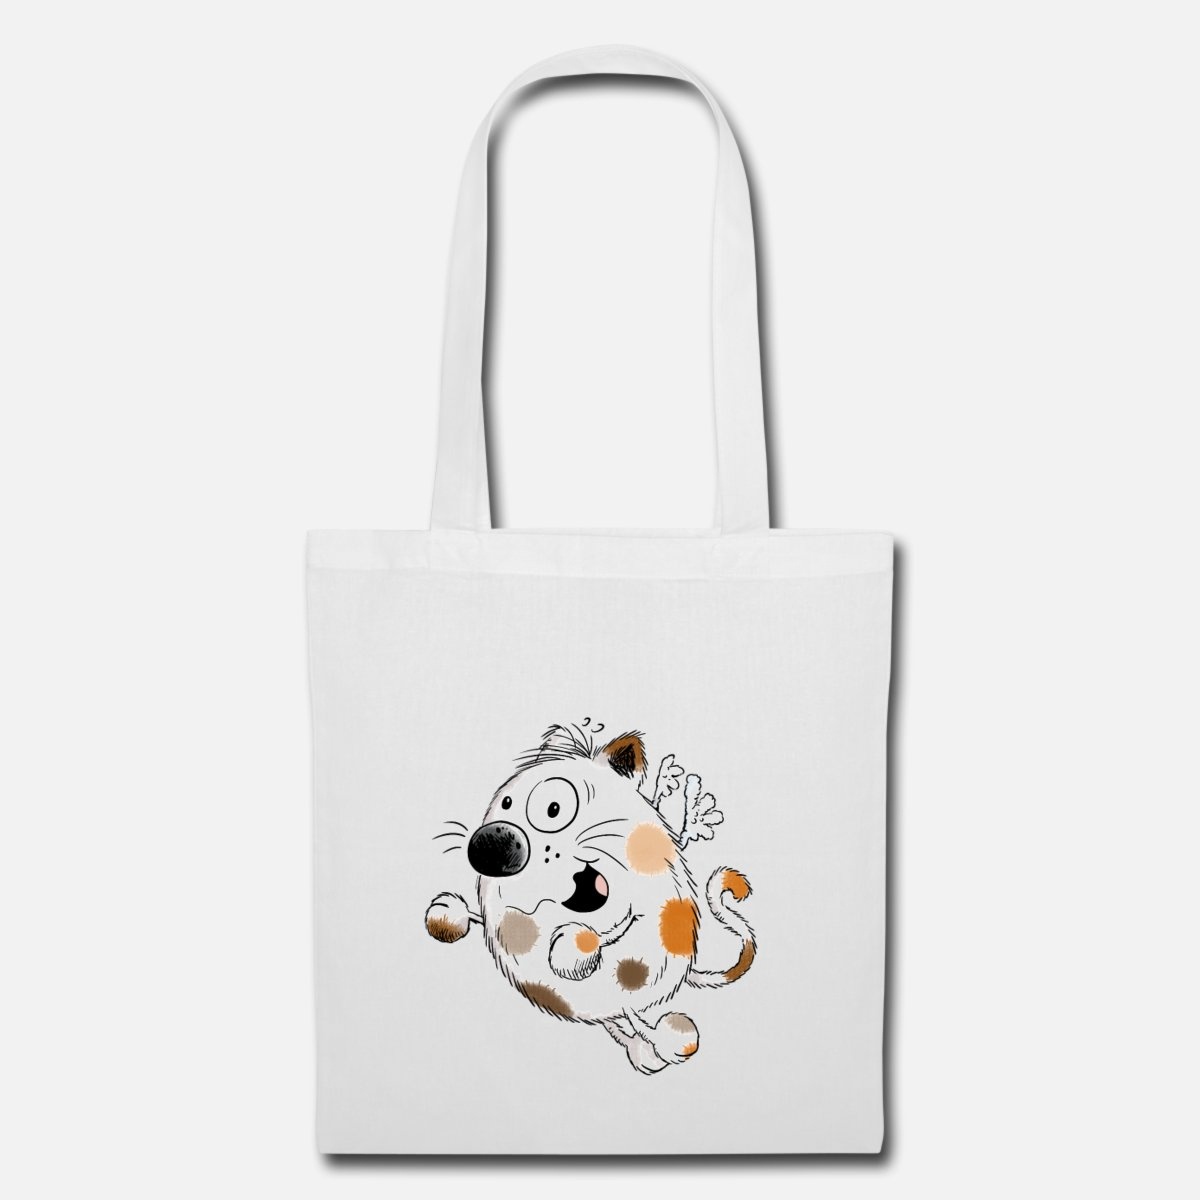 Hug Me Chat Dessin Animé - Cadeau Tote Bag - Blanc concernant Minou Dessin